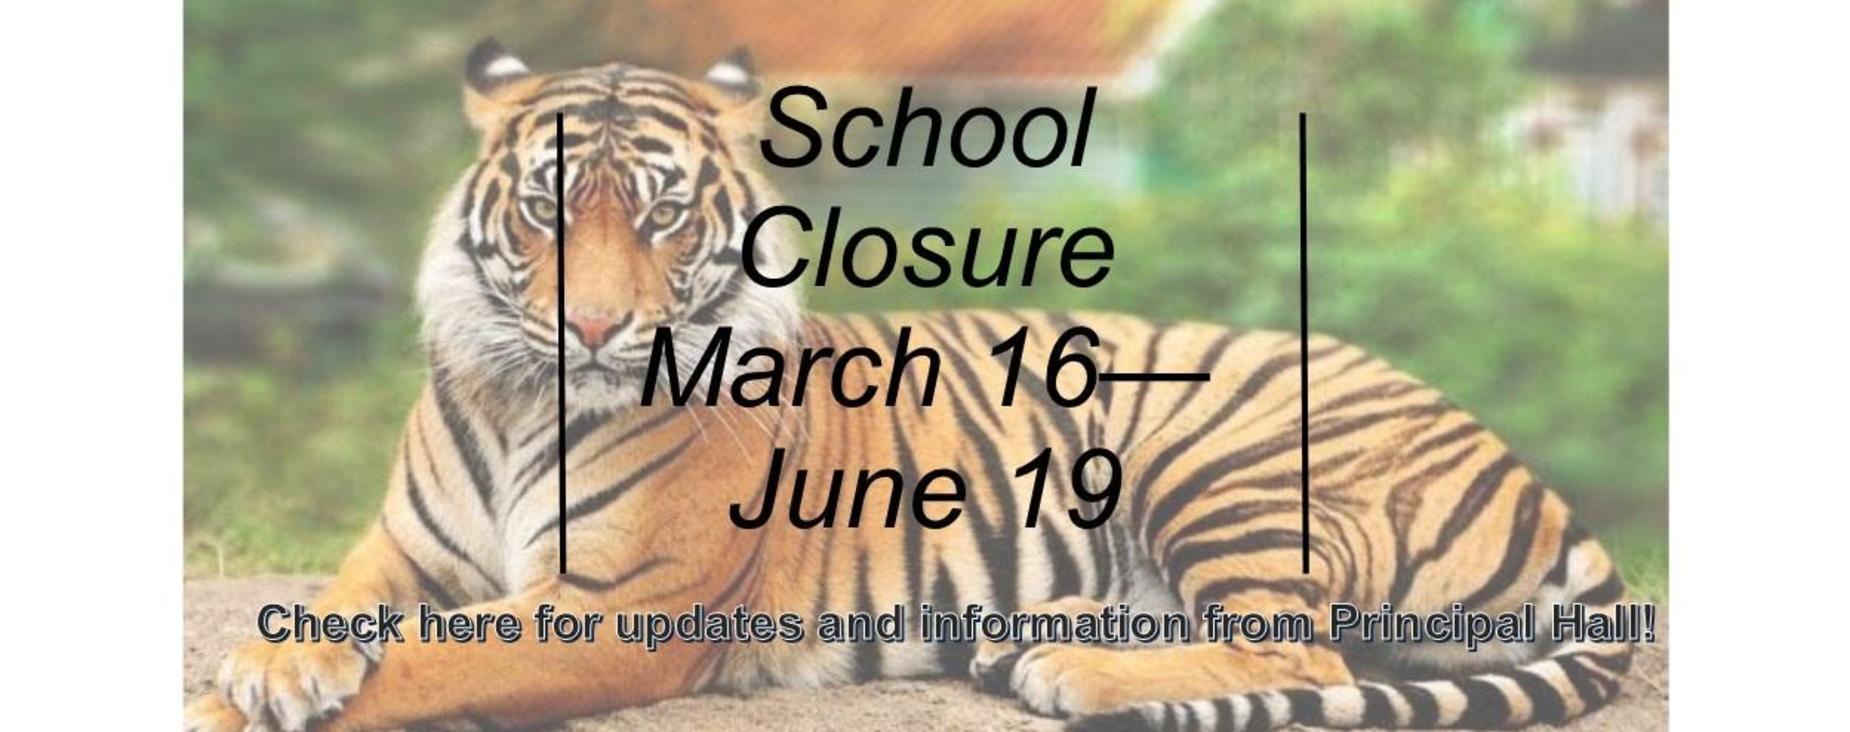 School Closure March 16 - June 19